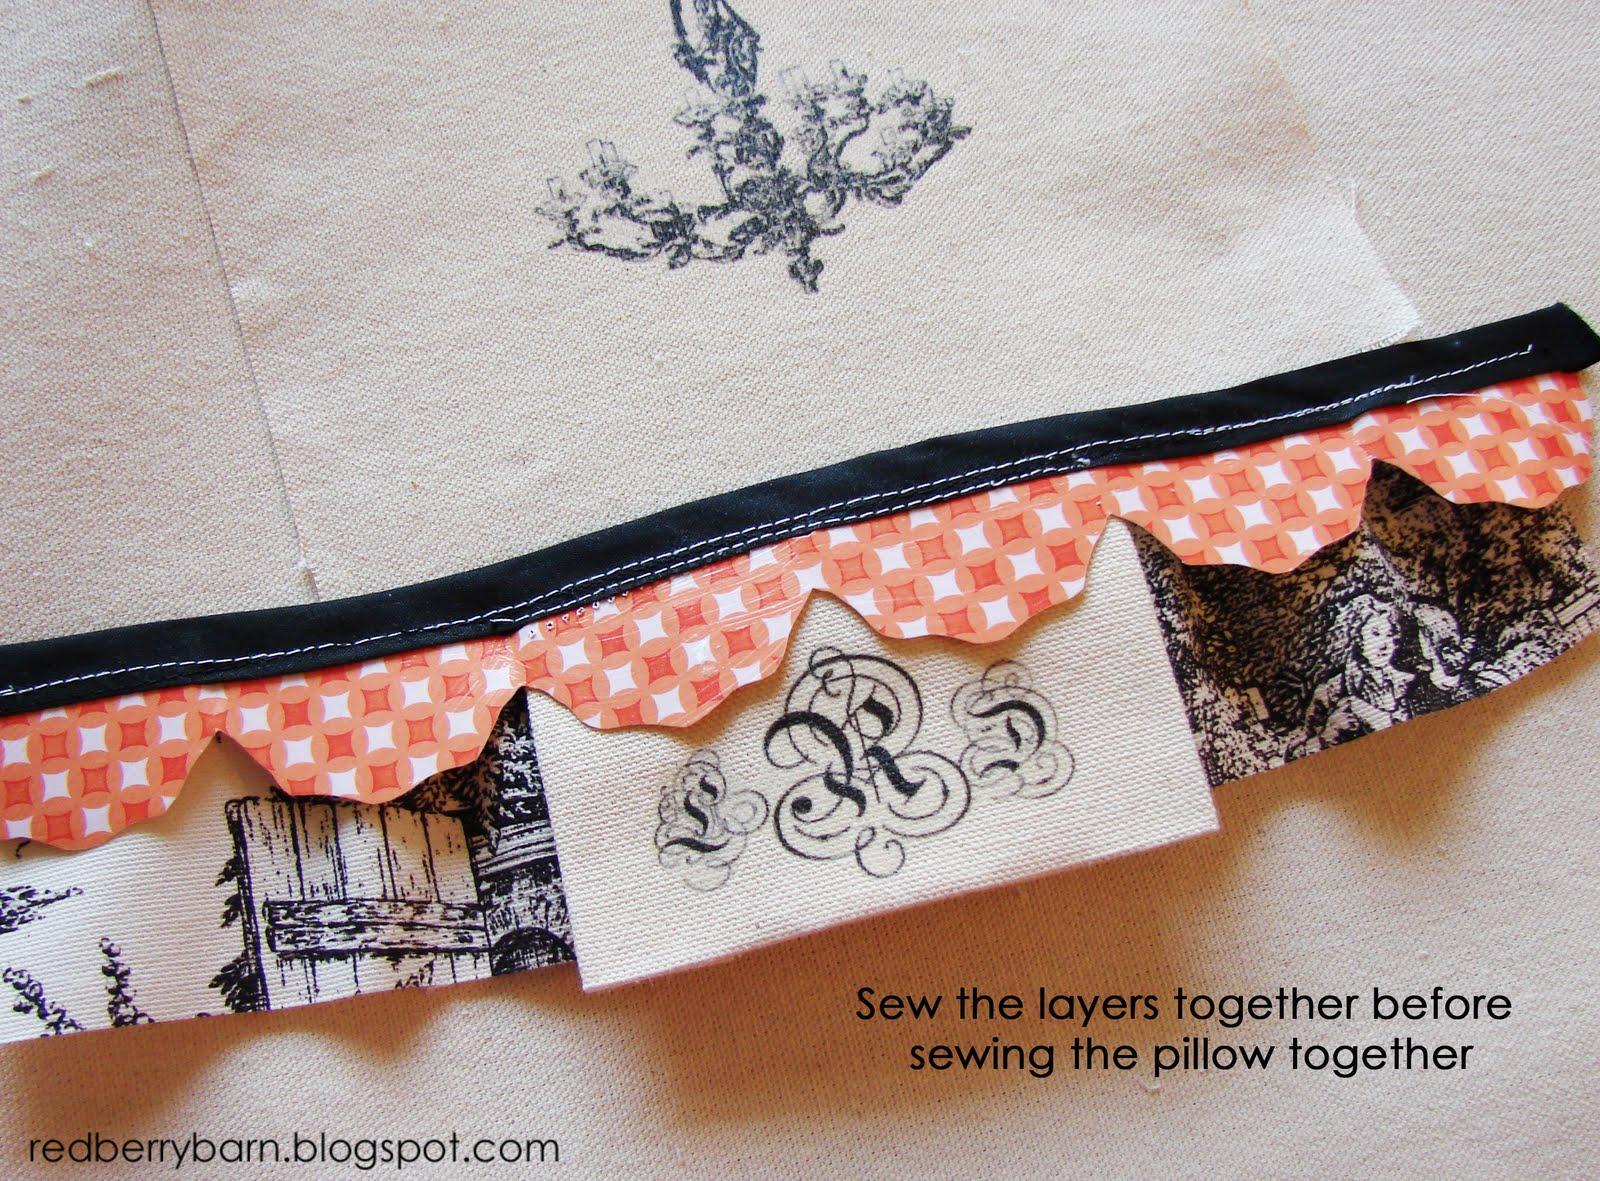 http://4.bp.blogspot.com/_5R1cHzQOAsI/TAW0Z3OVs9I/AAAAAAAADzo/46JaQzFpp08/s1600/Chandelier+Pillow+trim.jpg